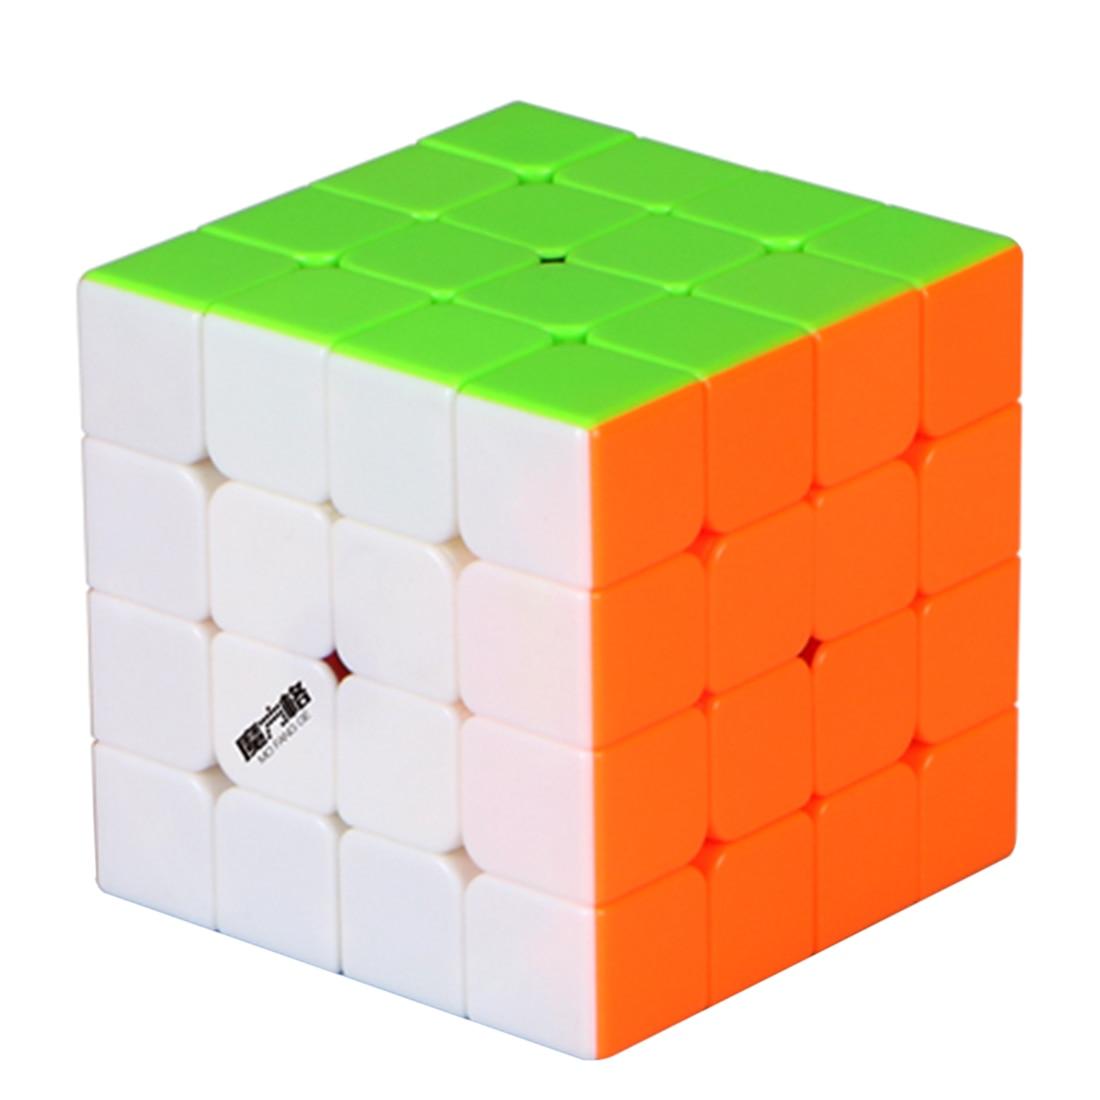 QiYi Mofangge Thunderclap Mini 6.0cm 4x4x4 Magic Cube Puzzle Toy for Competition